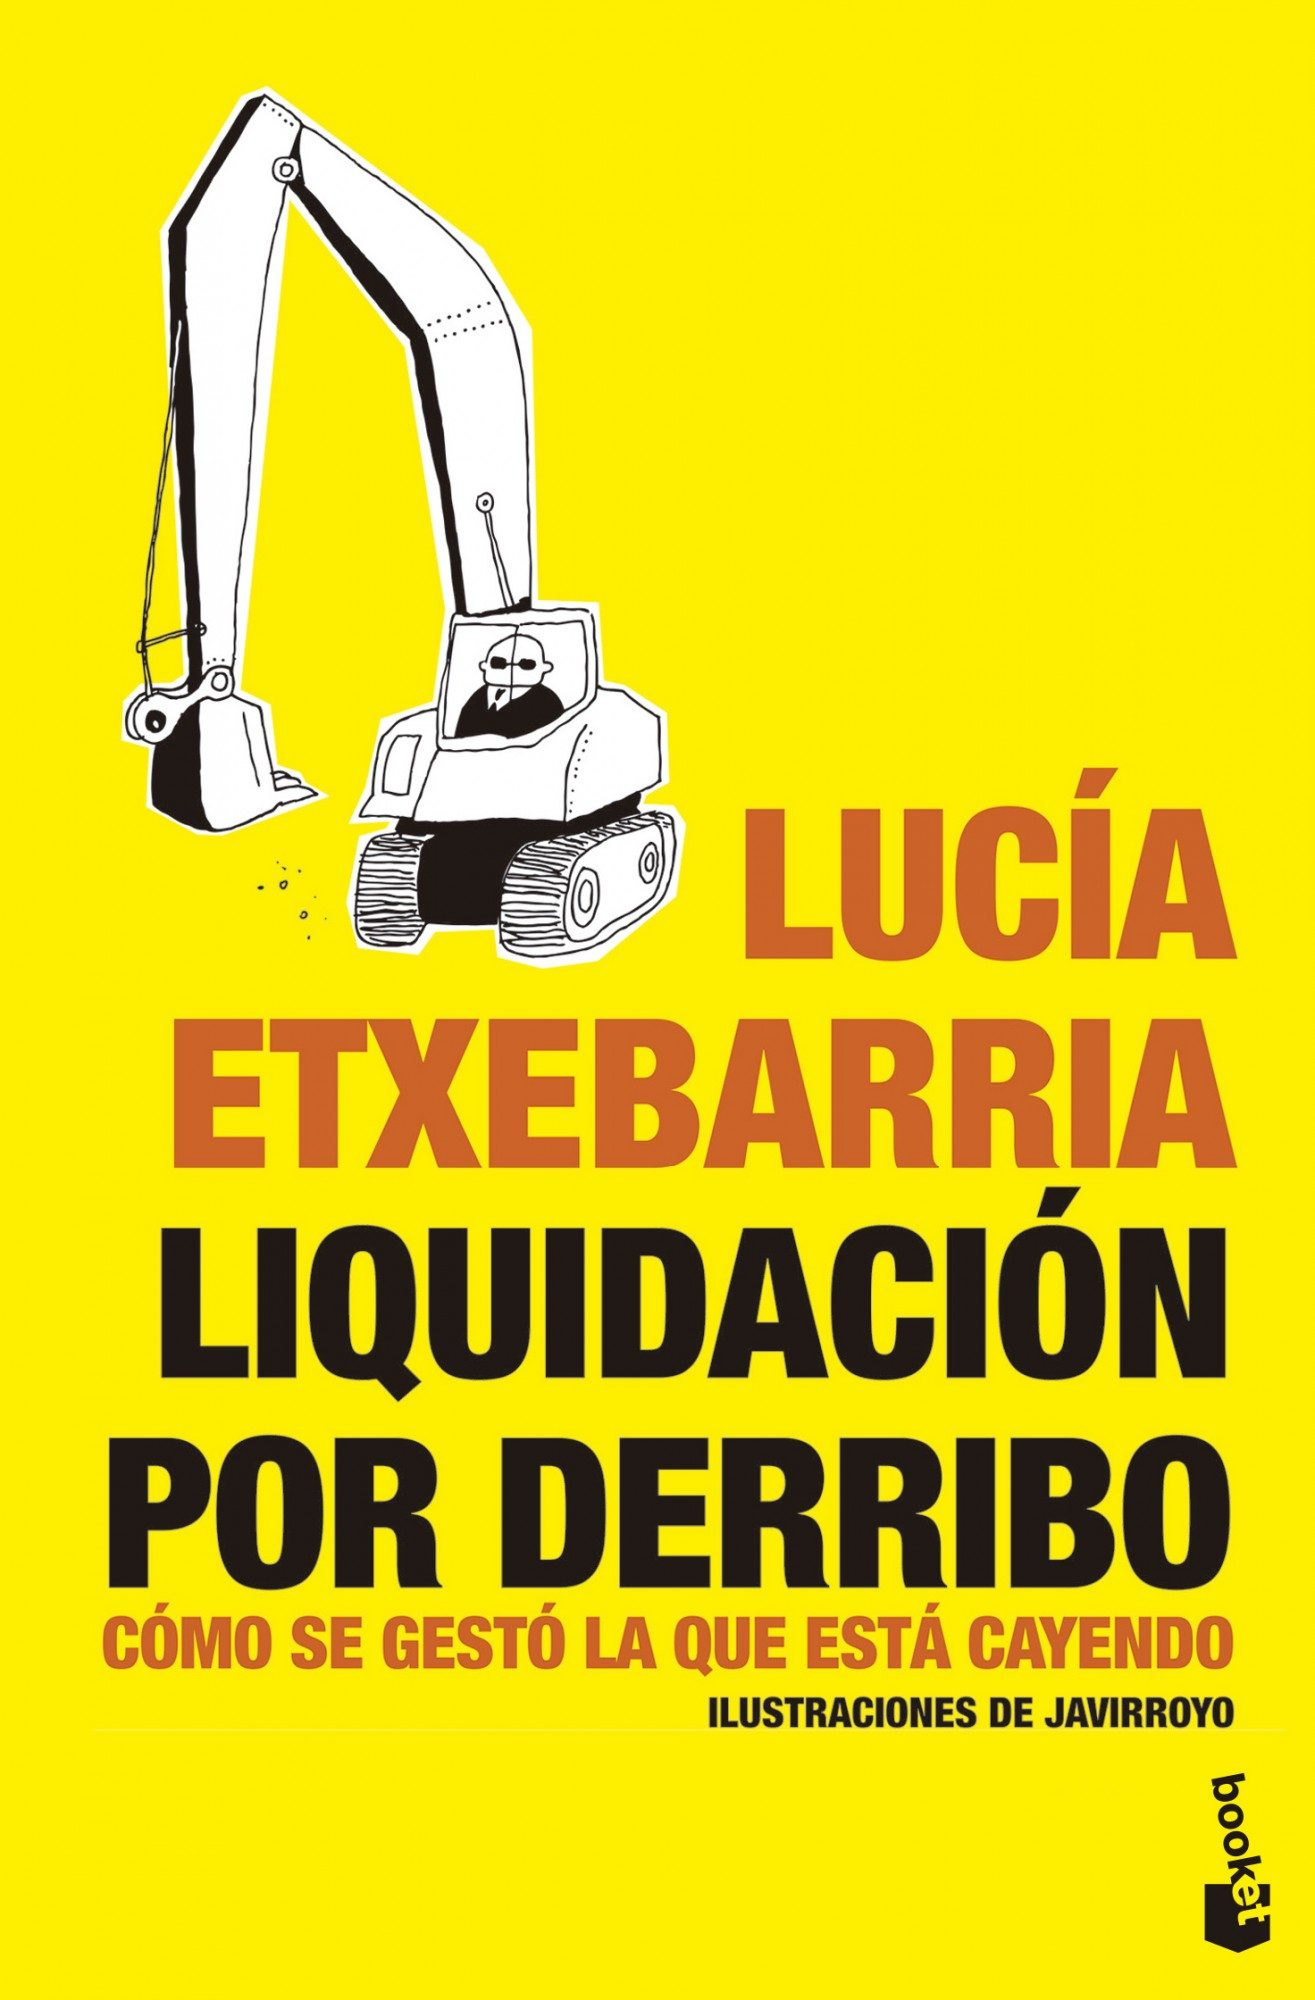 Lucia etxebarria 13